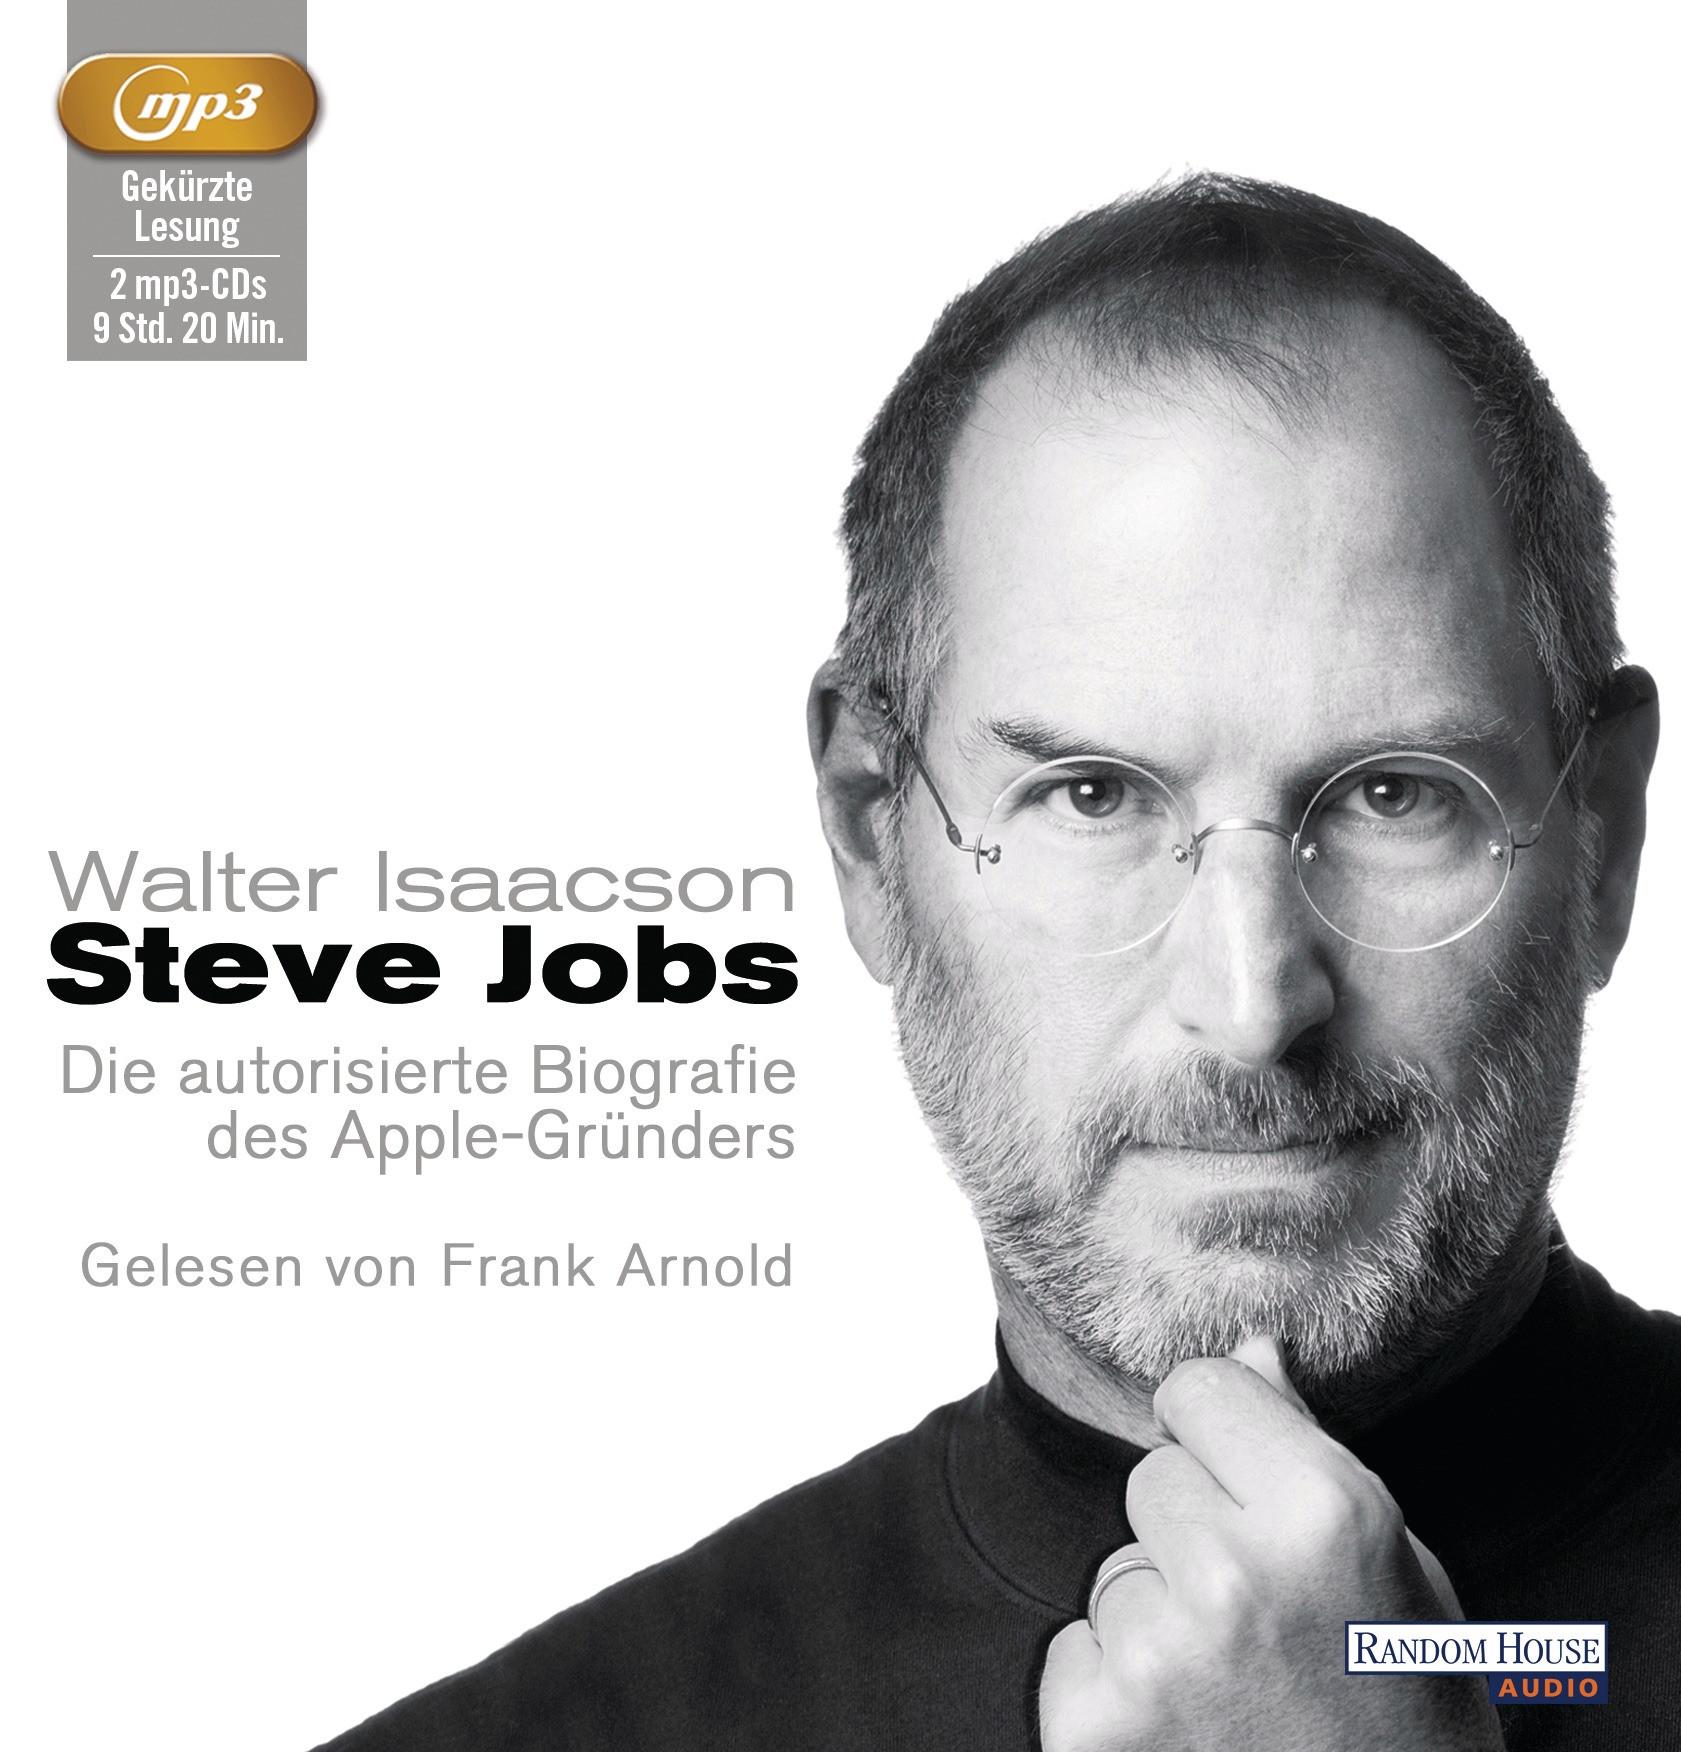 Walter Isaacson - Steve Jobs (mp3-CDs)